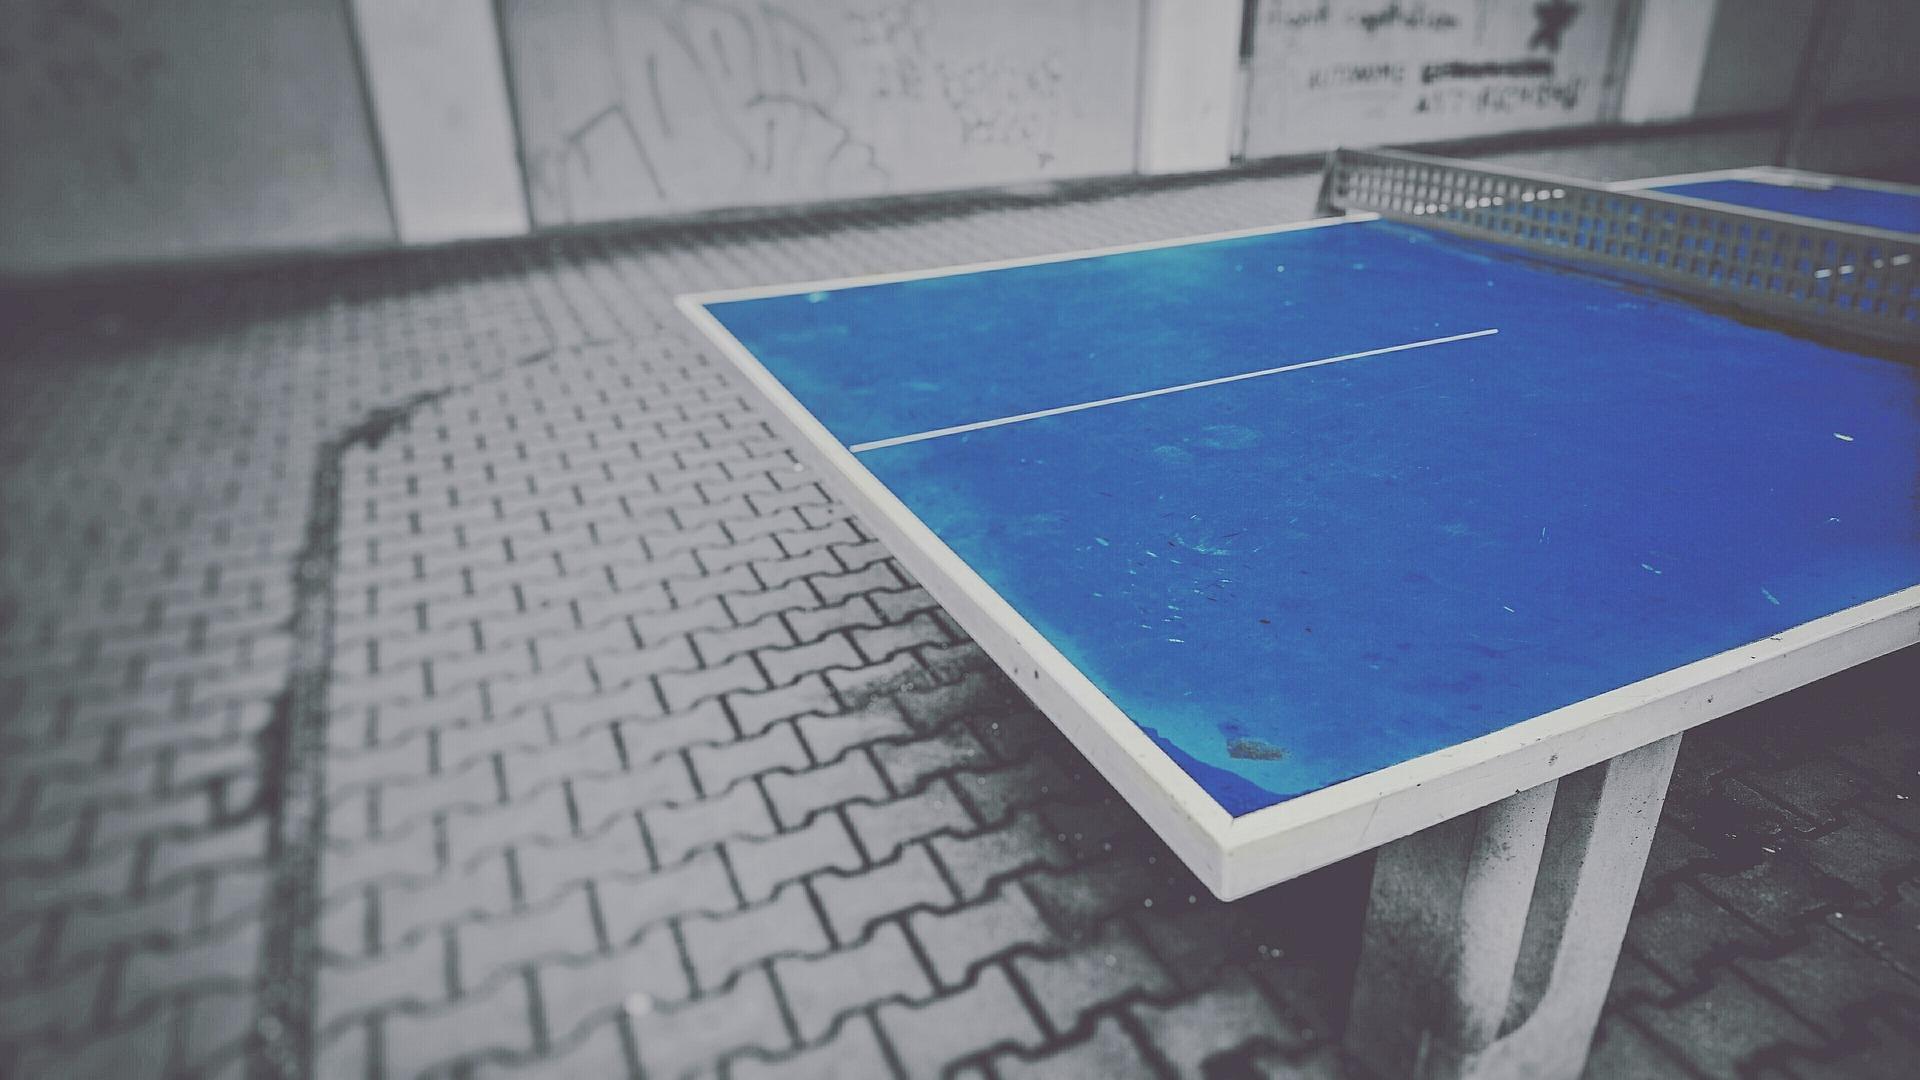 table-tennis-1648005_1920.jpg